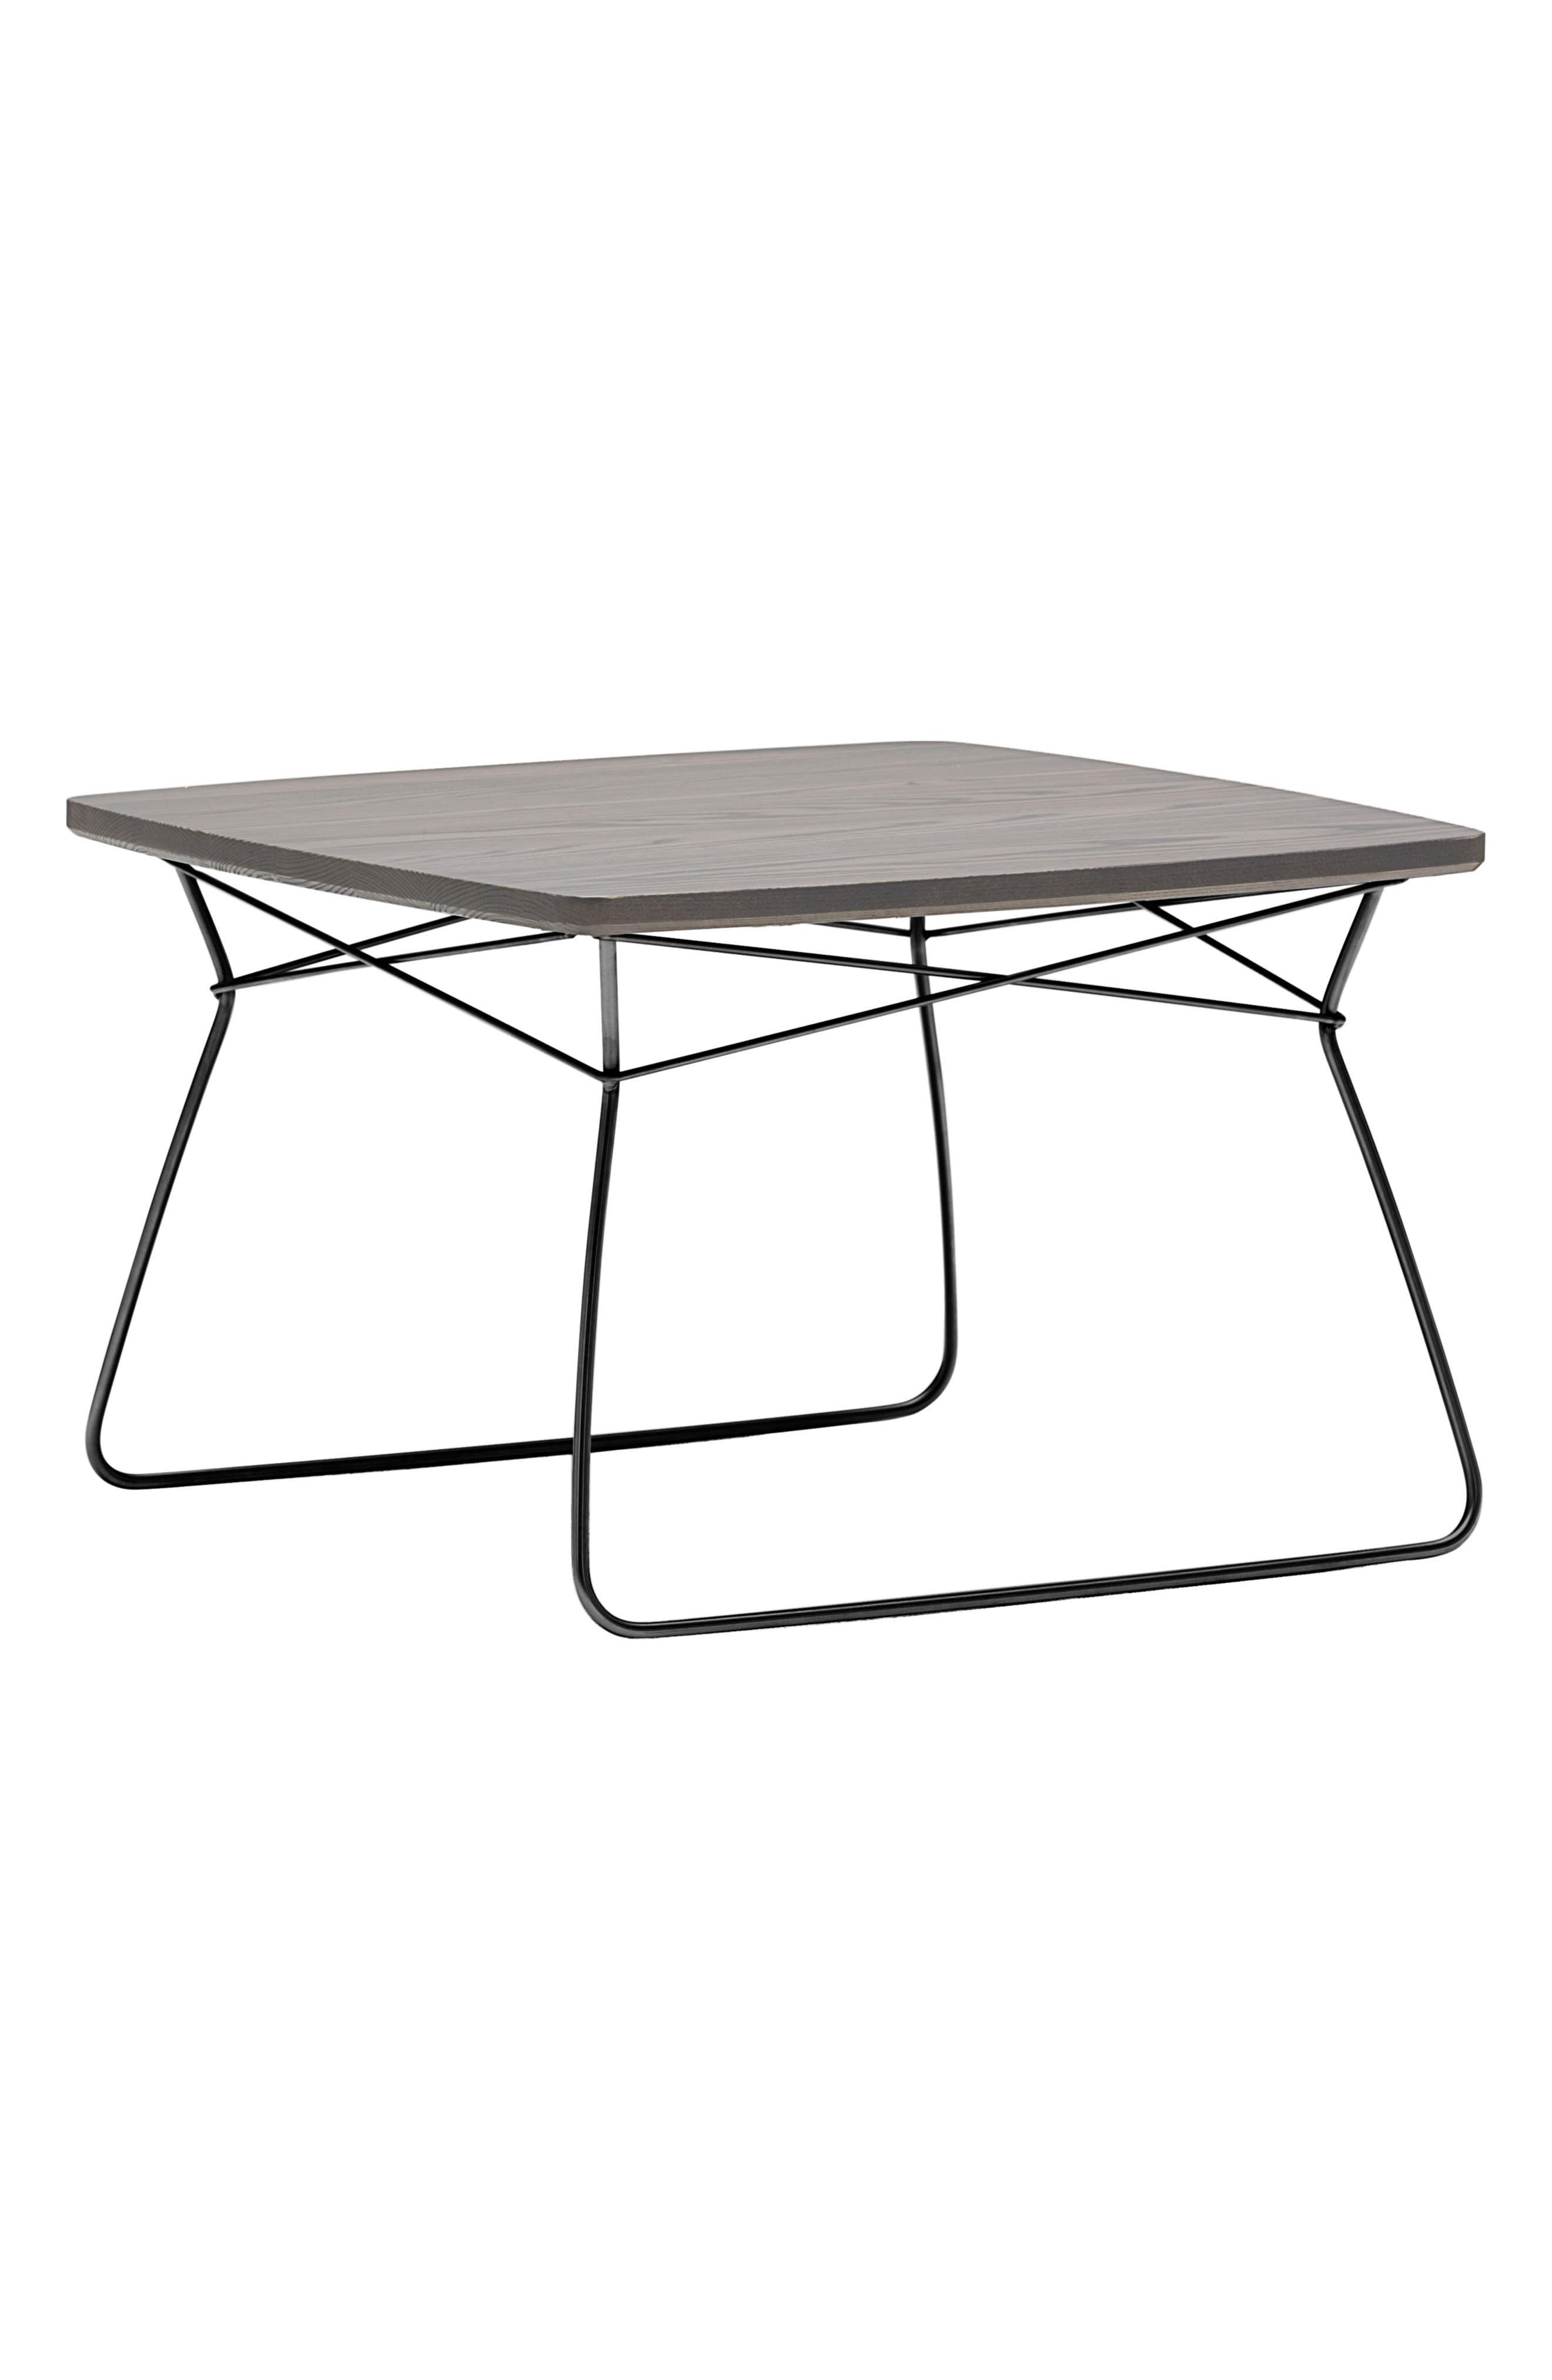 Alternate Image 1 Selected - Design on Stock USA Dalt Side Table